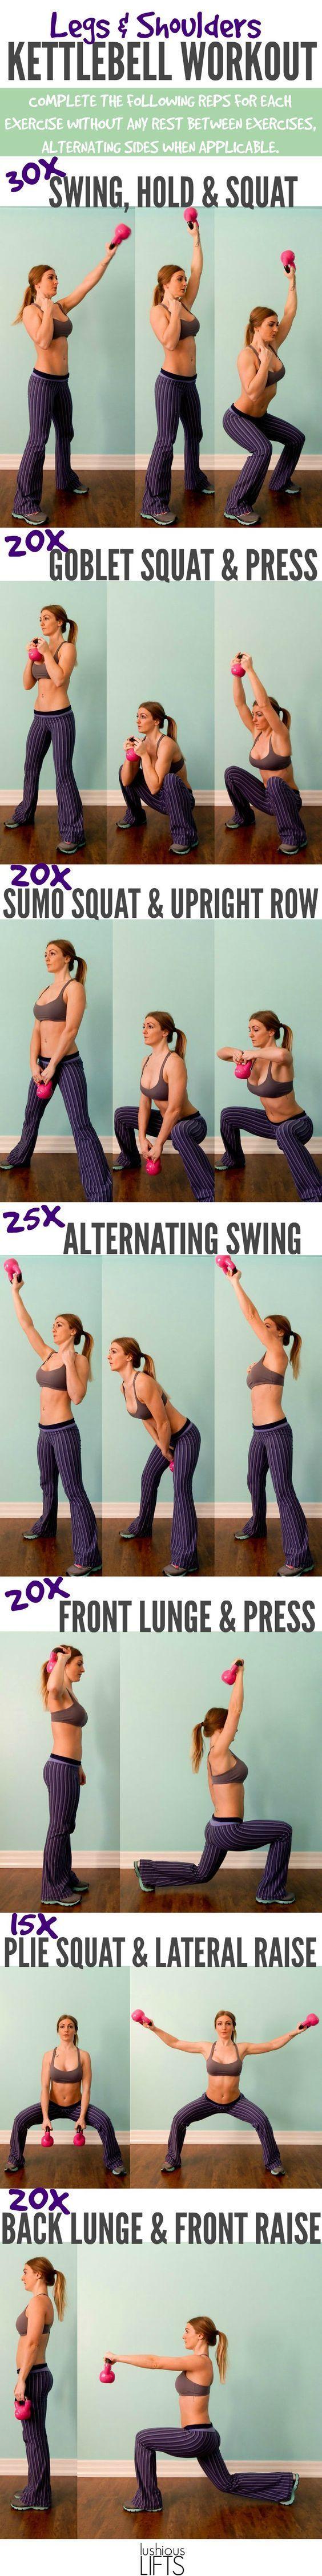 Legs and Shoulders Kettlebell Workout    Lushious Lifts https://www.kettlebellmaniac.com/kettlebell-exercises/